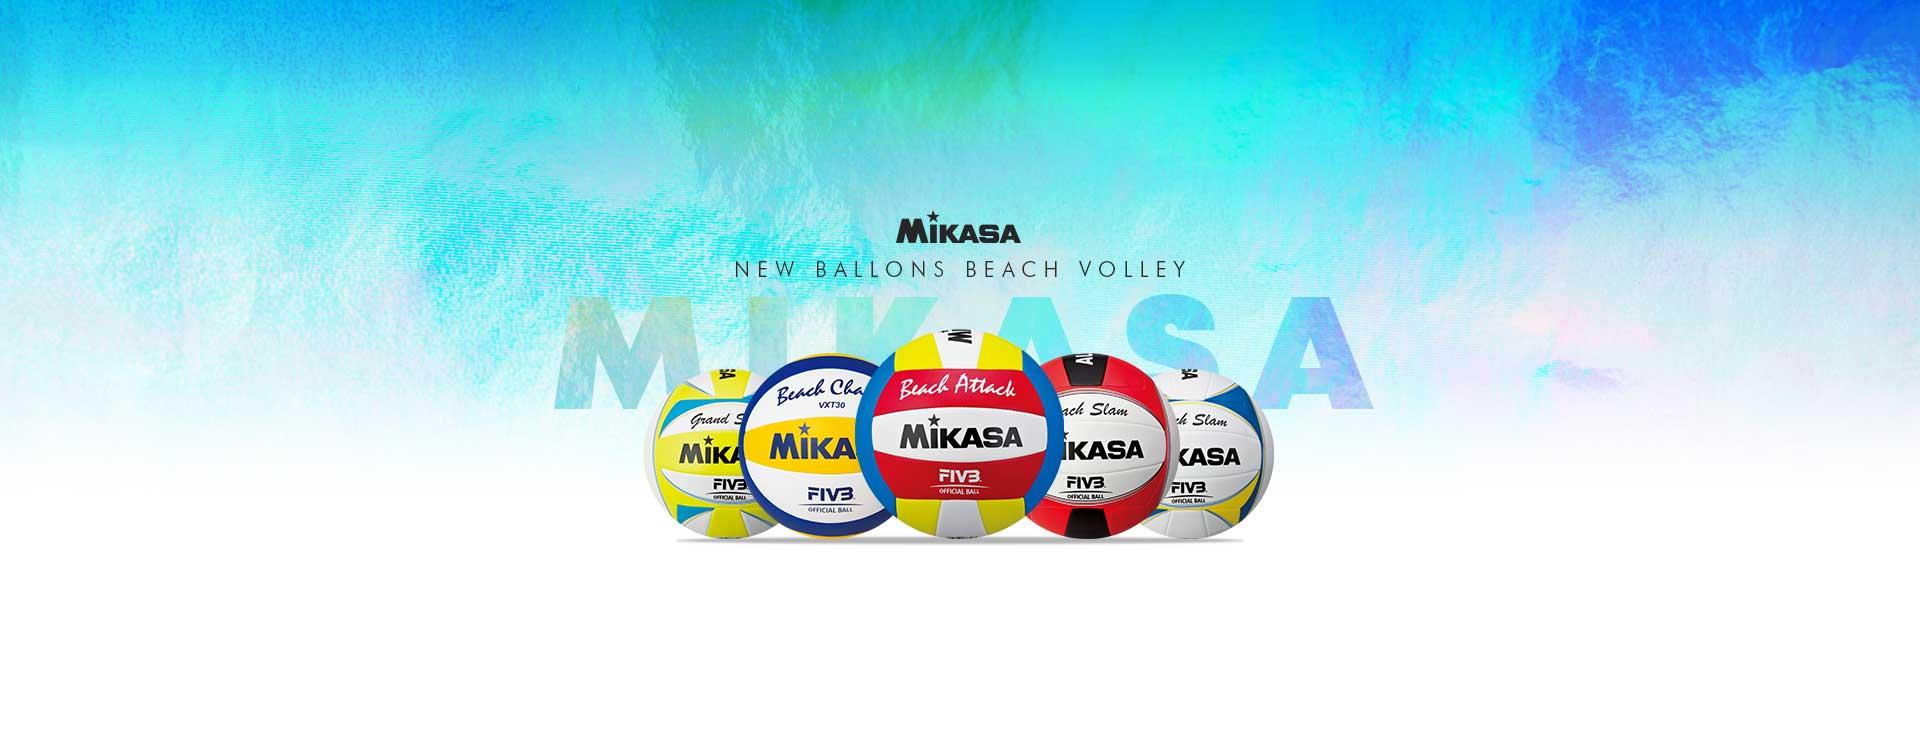 Ballons Mikasa